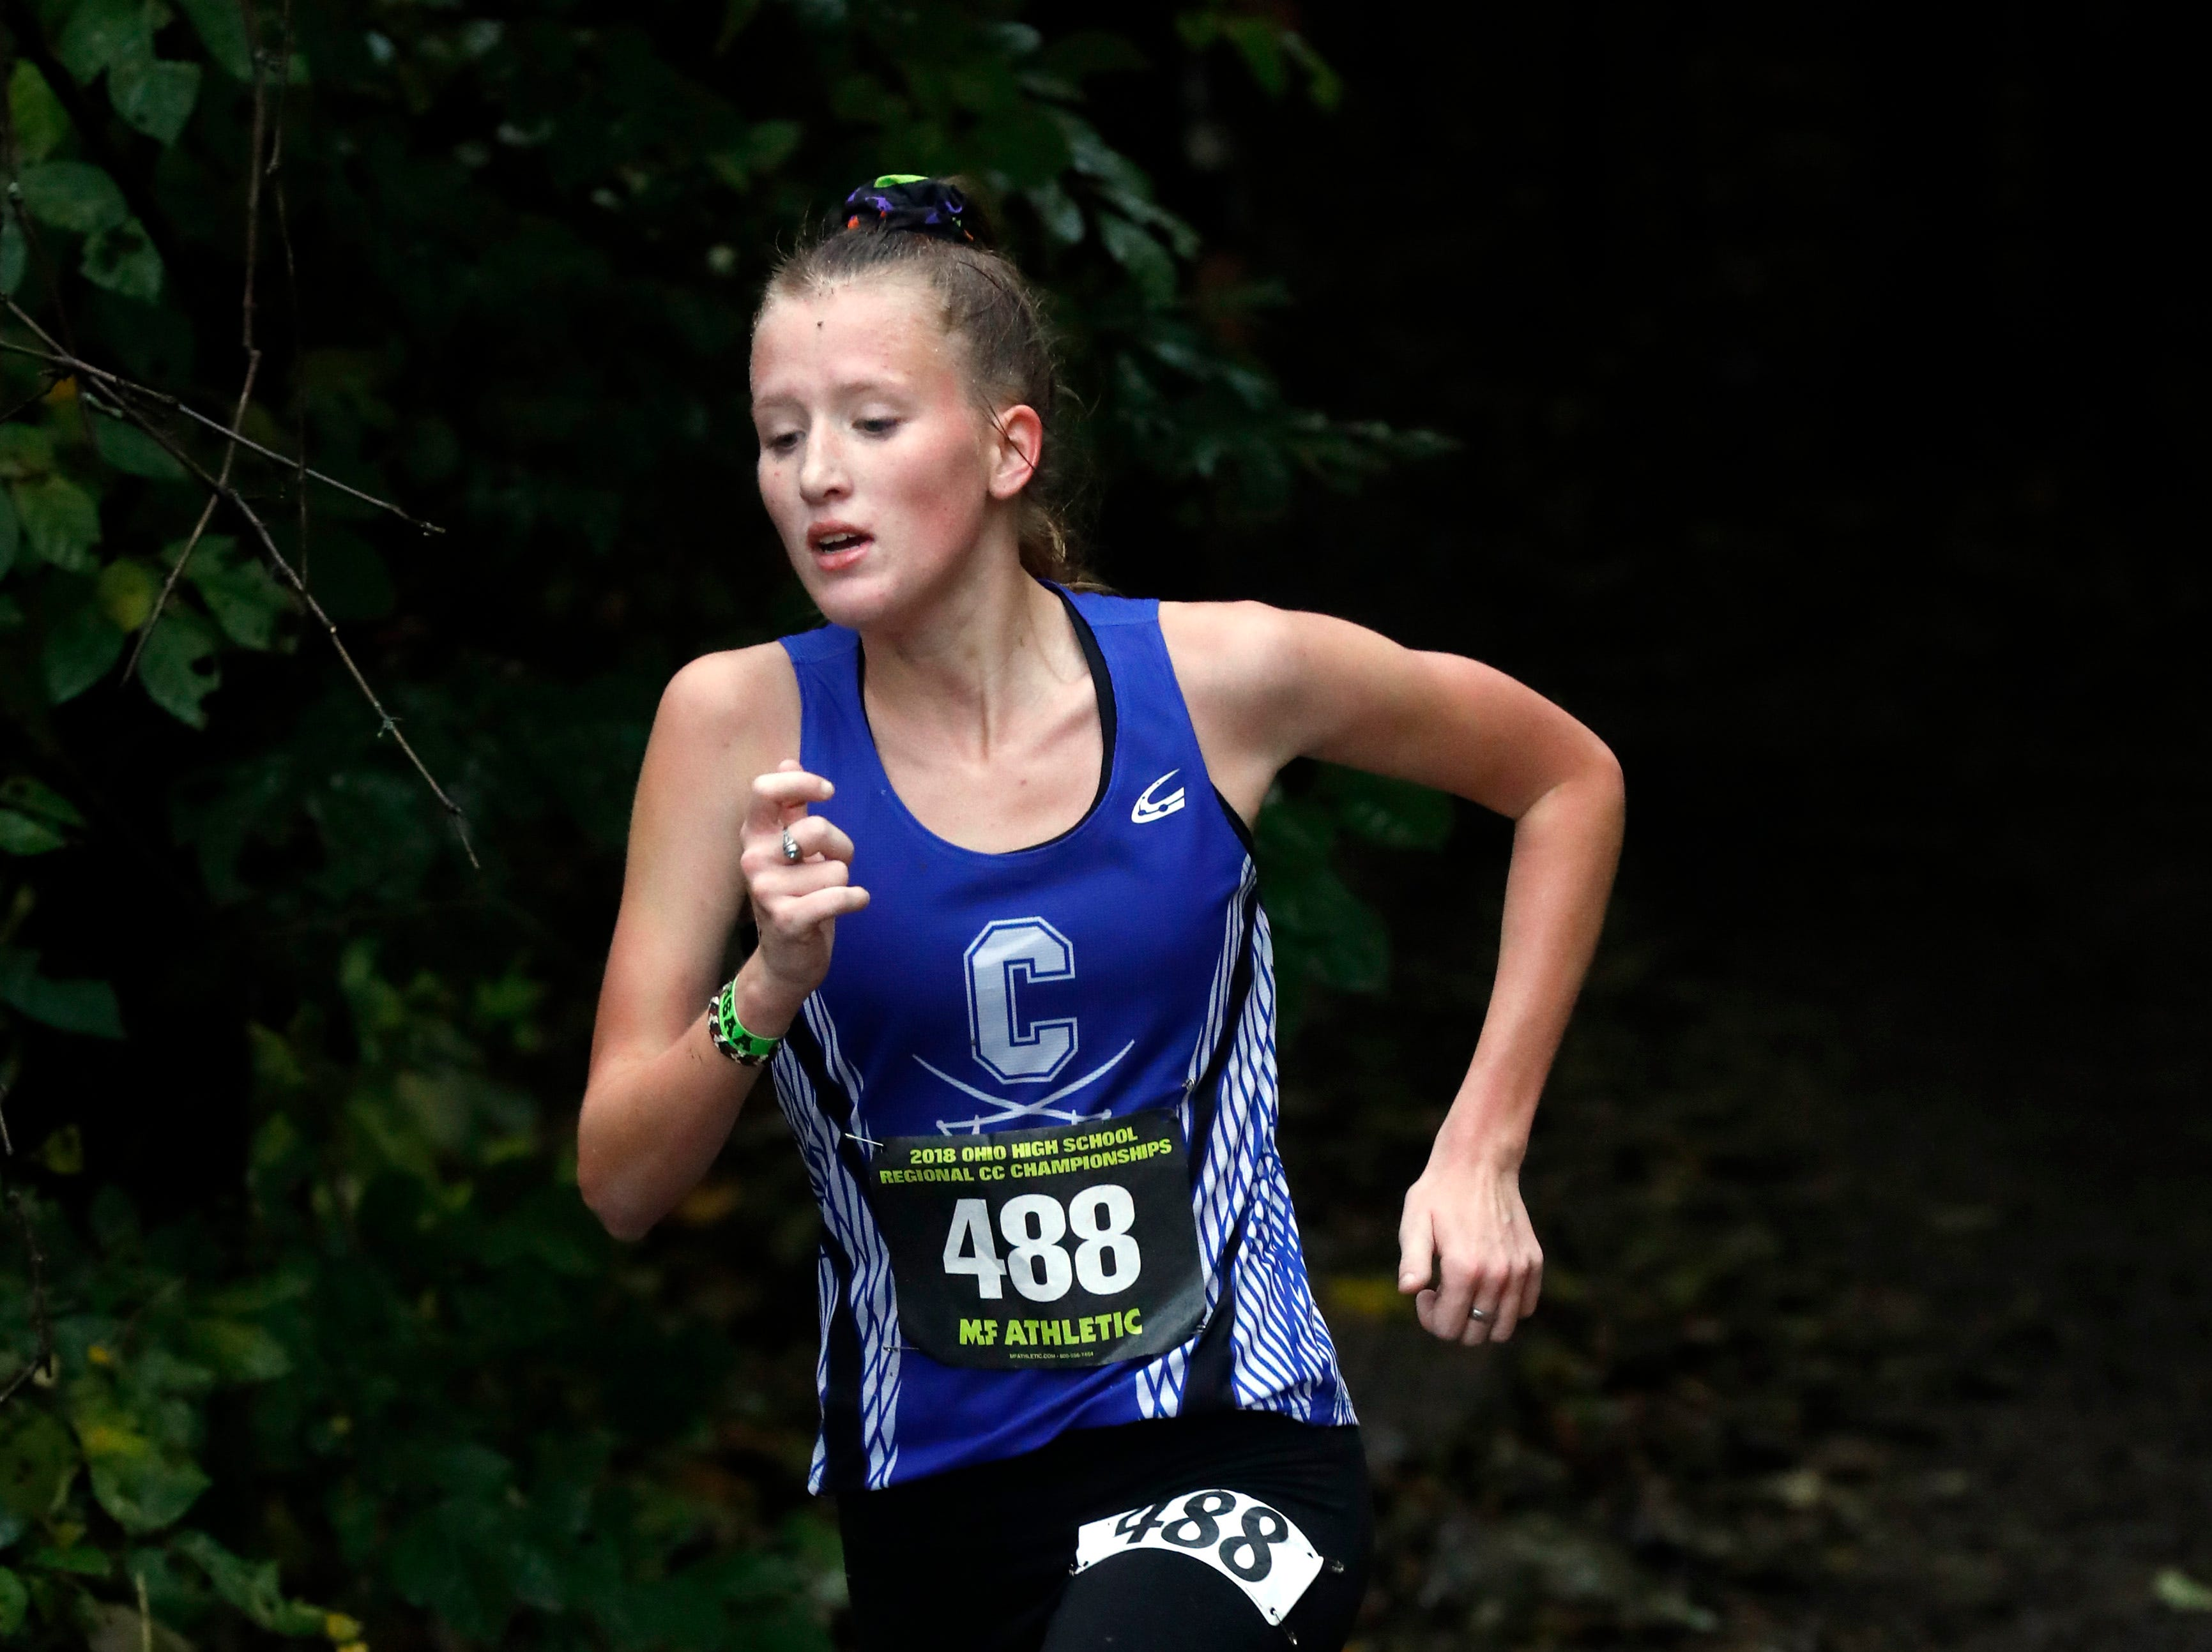 Chillicothe's Ella Cuzzolini runs in the Regional Cross Country meet Saturday, Oct. 27, 2018, at Pickerington North High School in Pickerington.